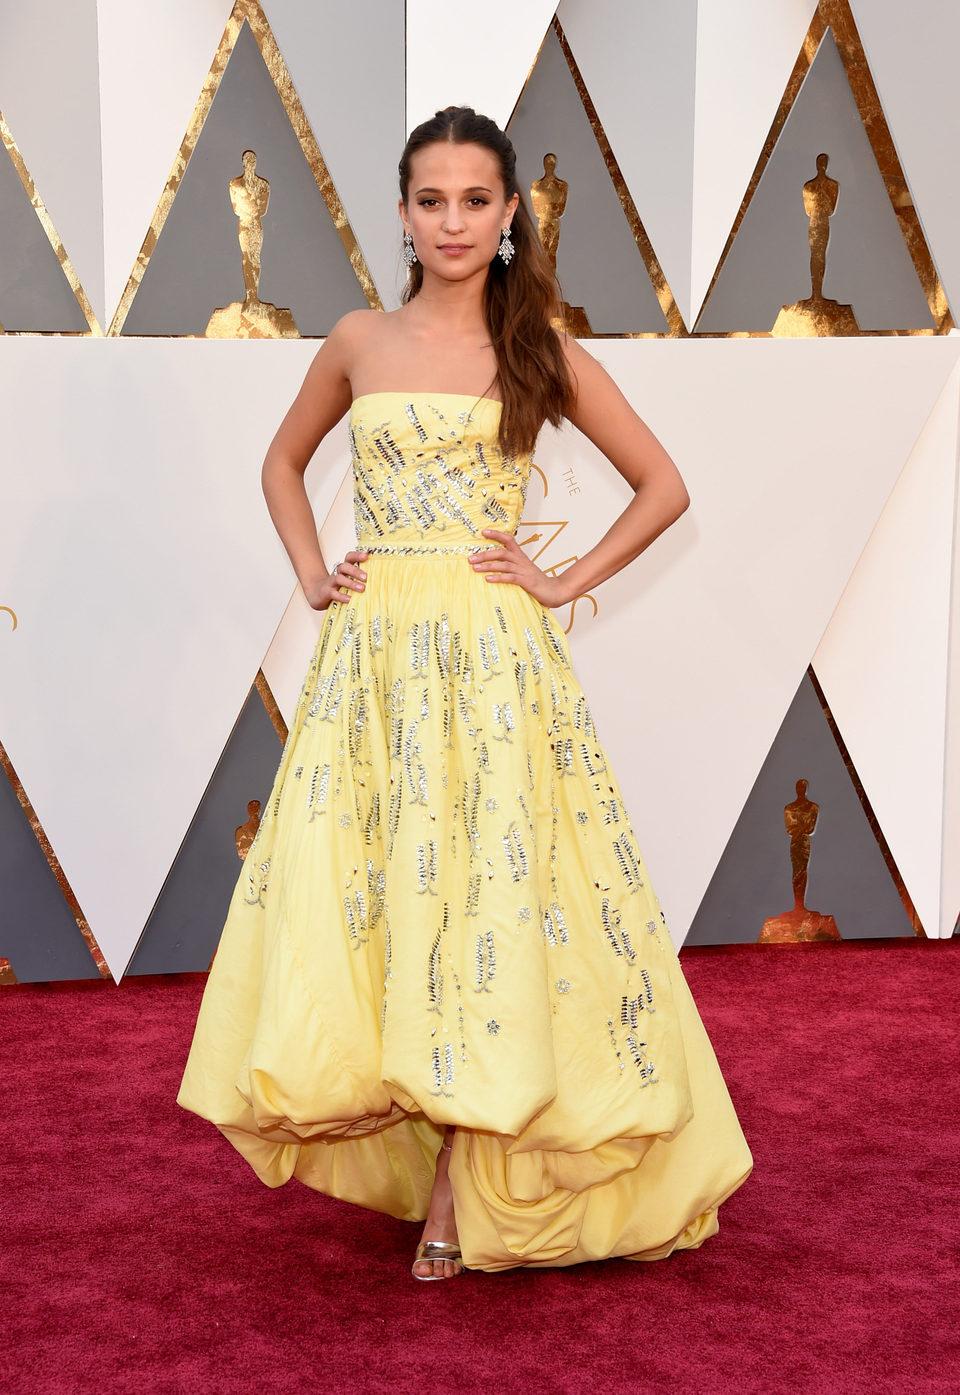 Alicia Vikander at the Oscars 2016 red carpet